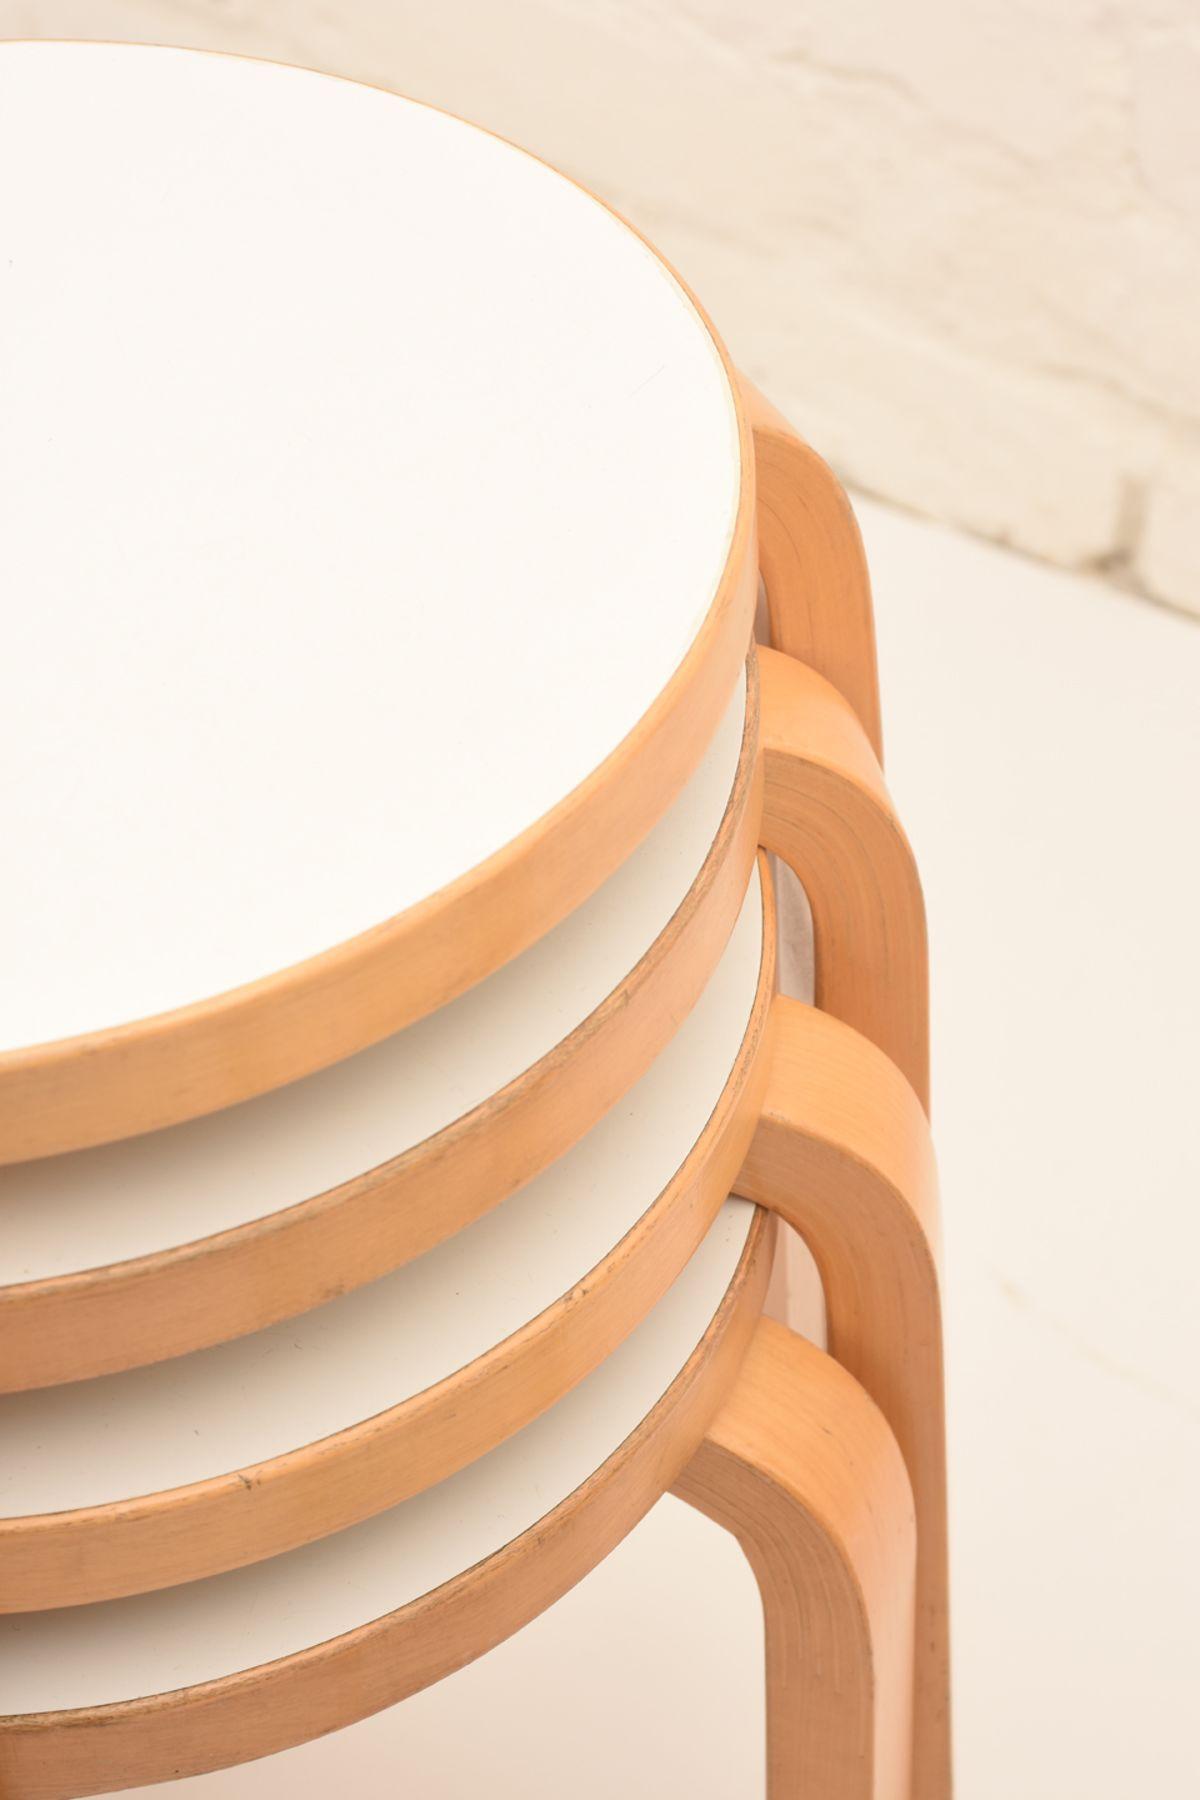 Alvar-Aalto_Stool60_H_Detail-02